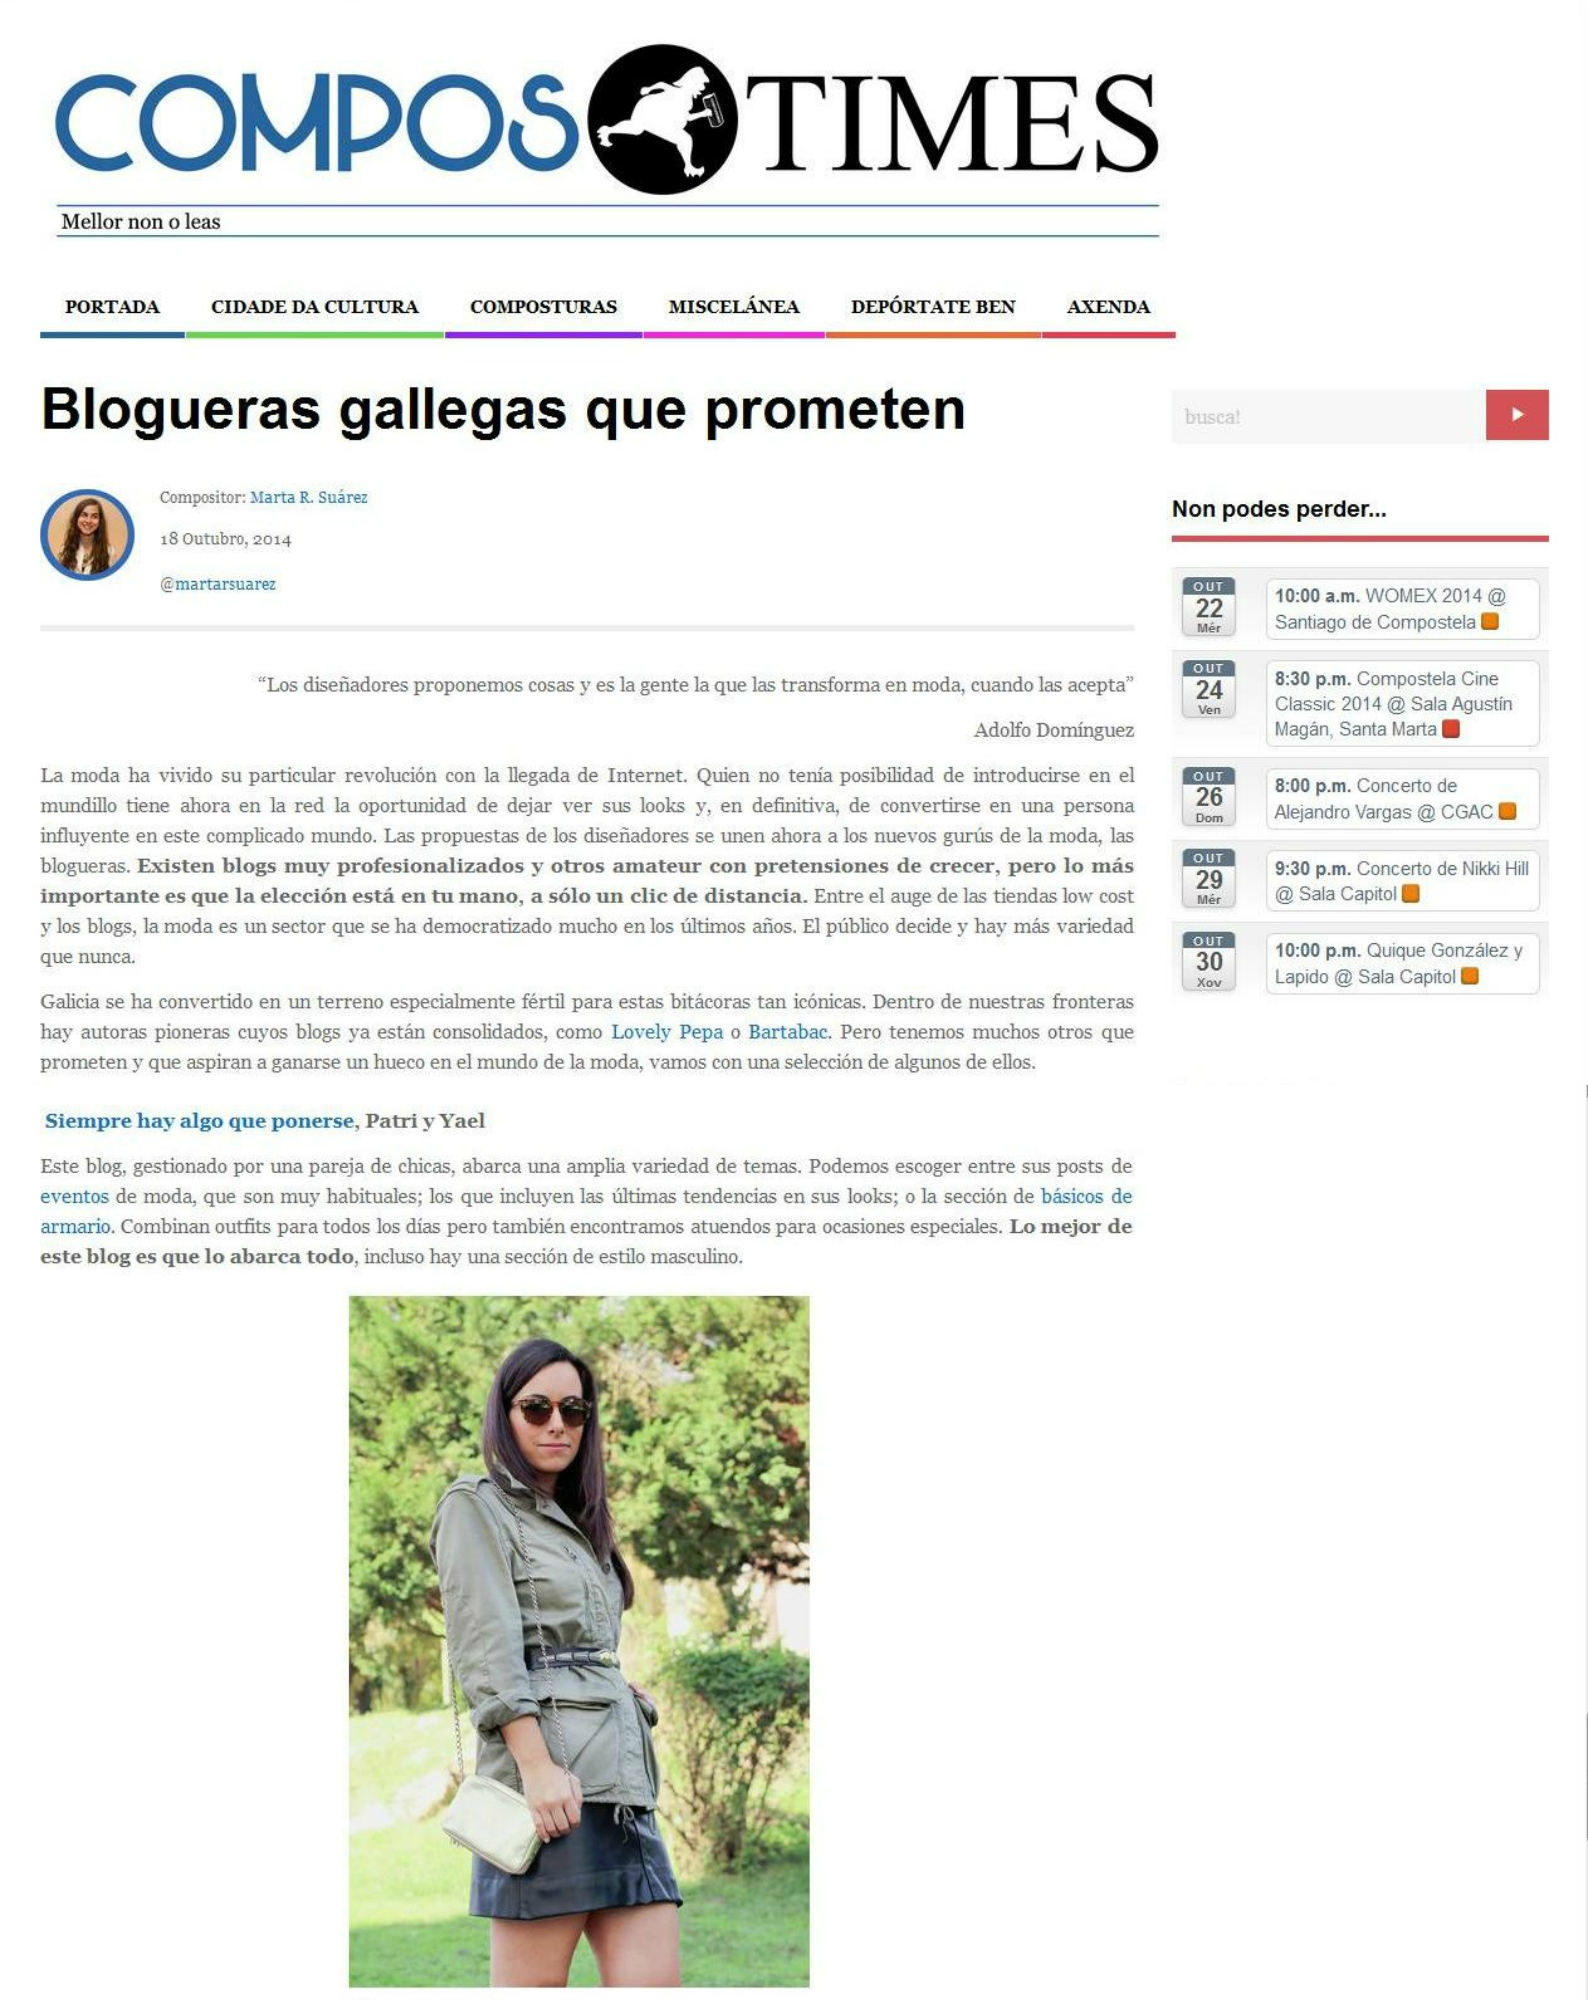 blogueras-gallegas-que-prometen-compostimes